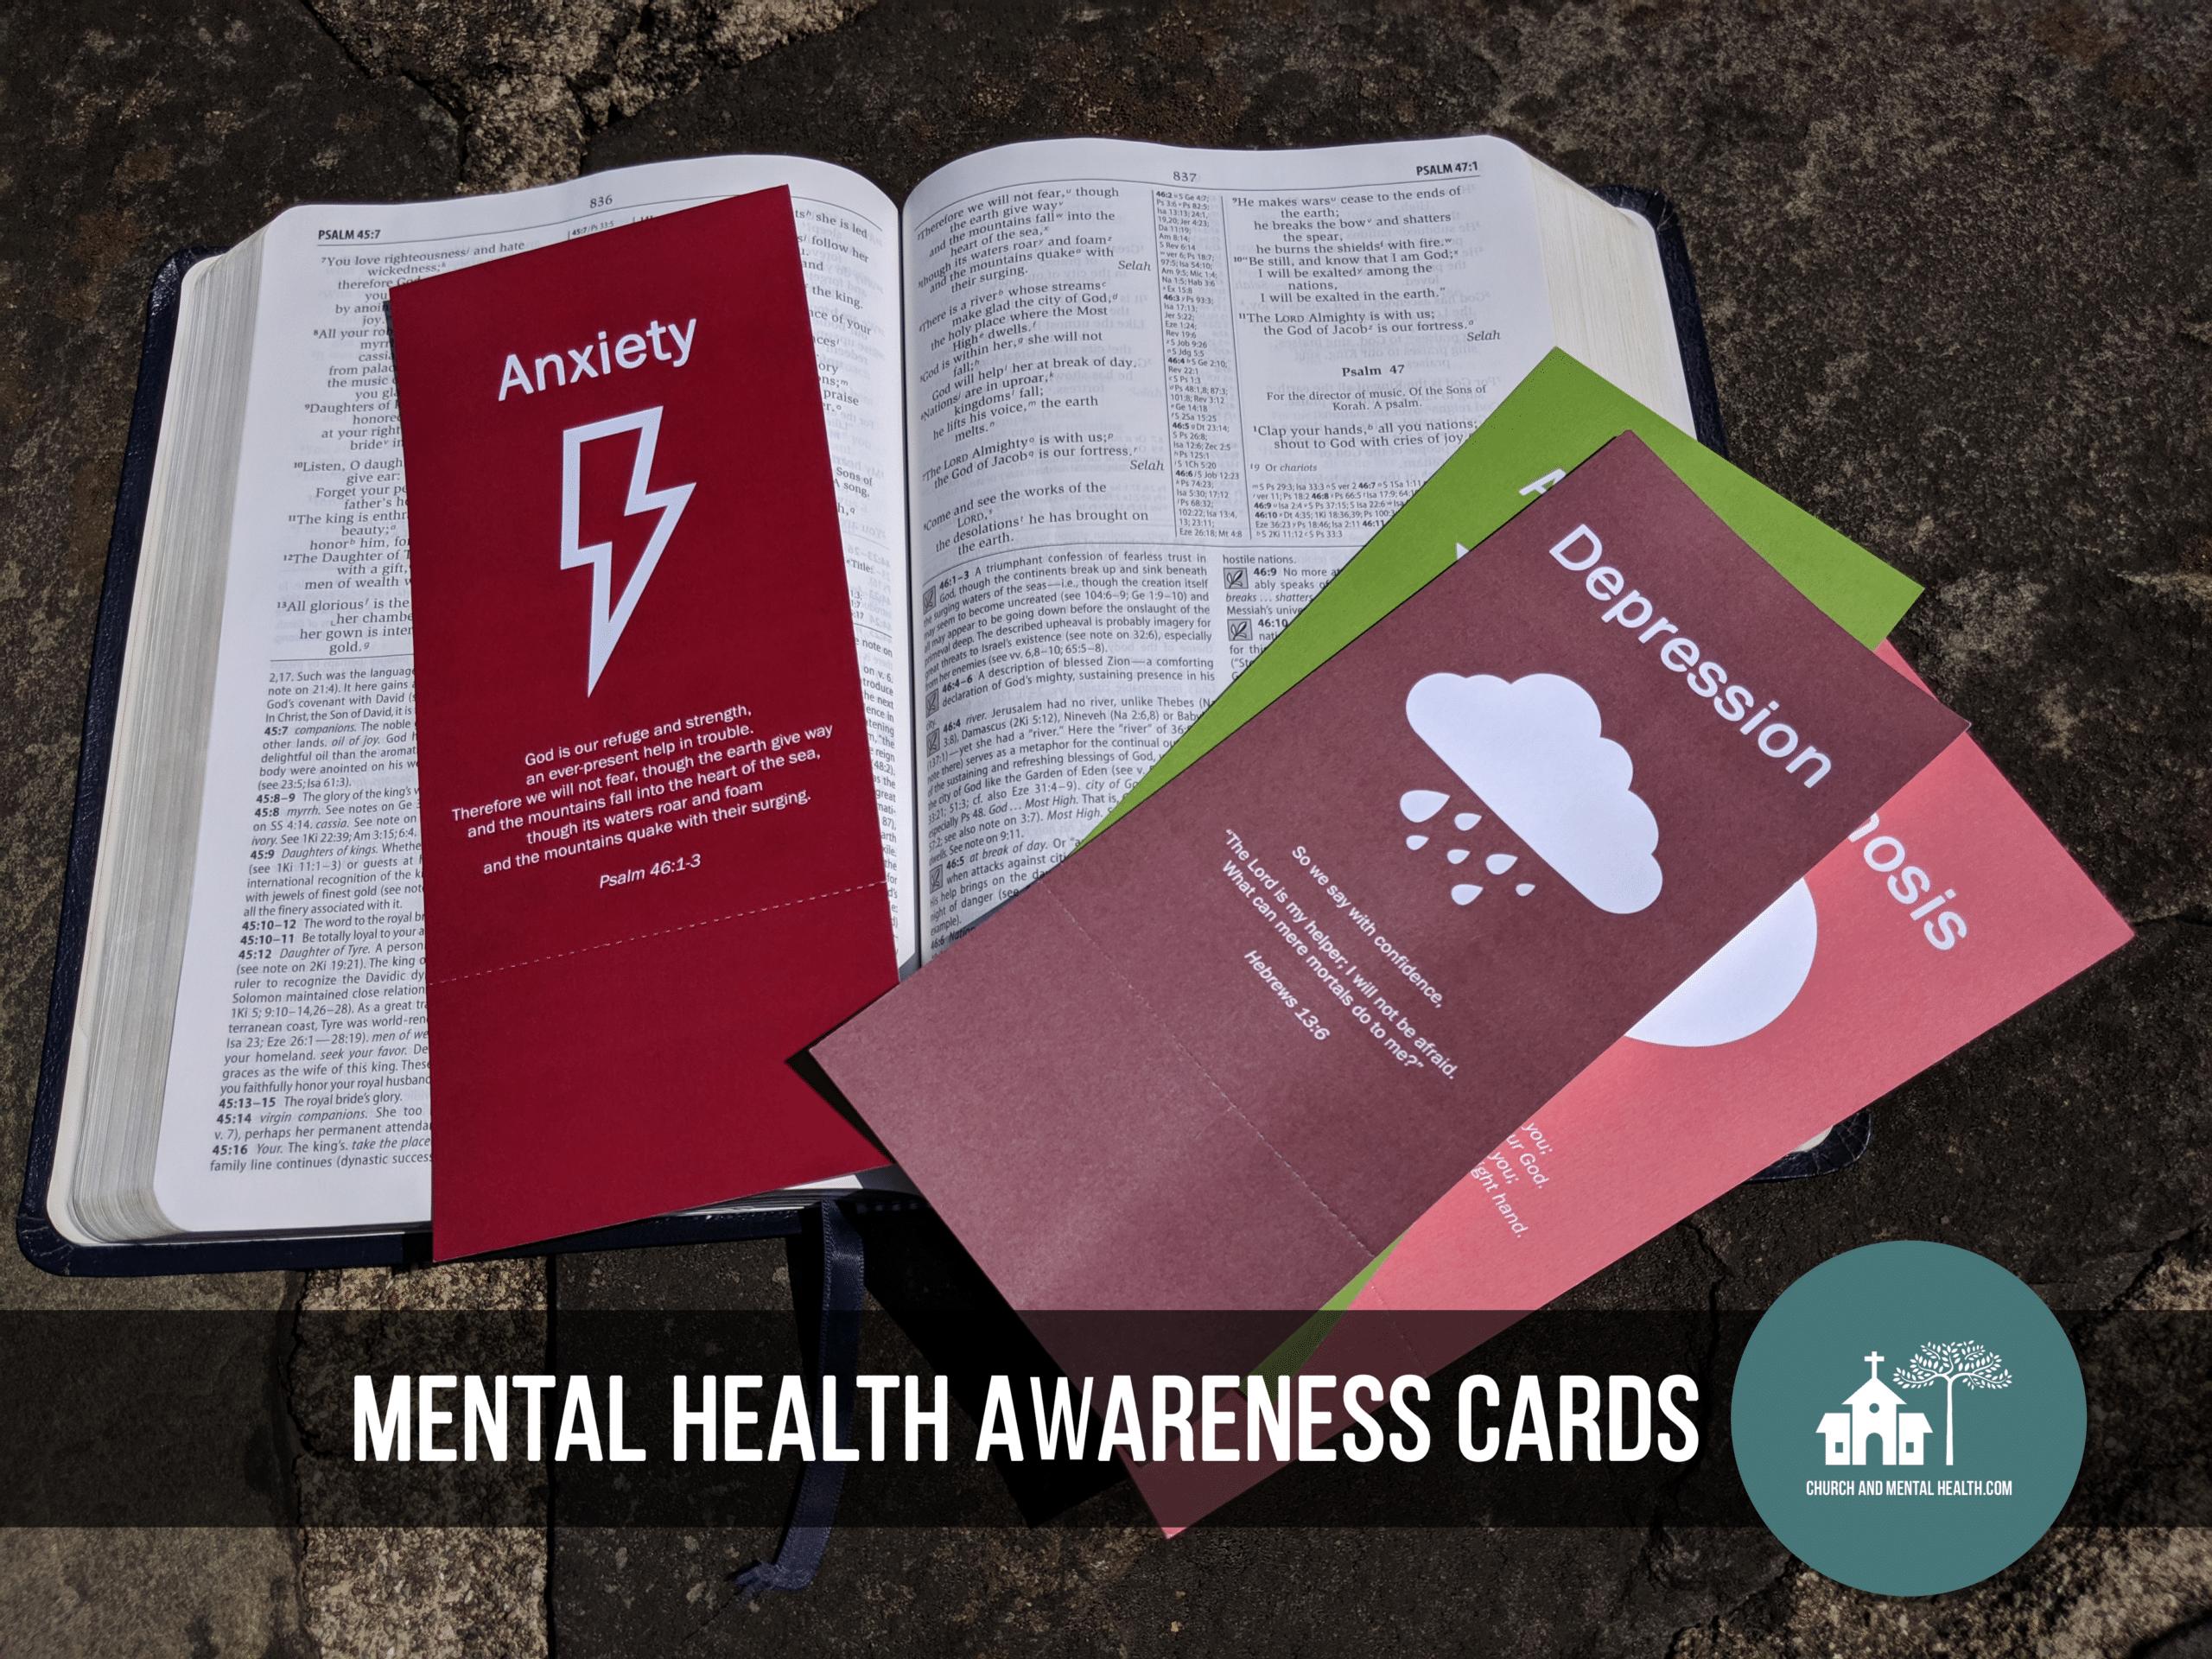 Church Mental Health Awareness Cards